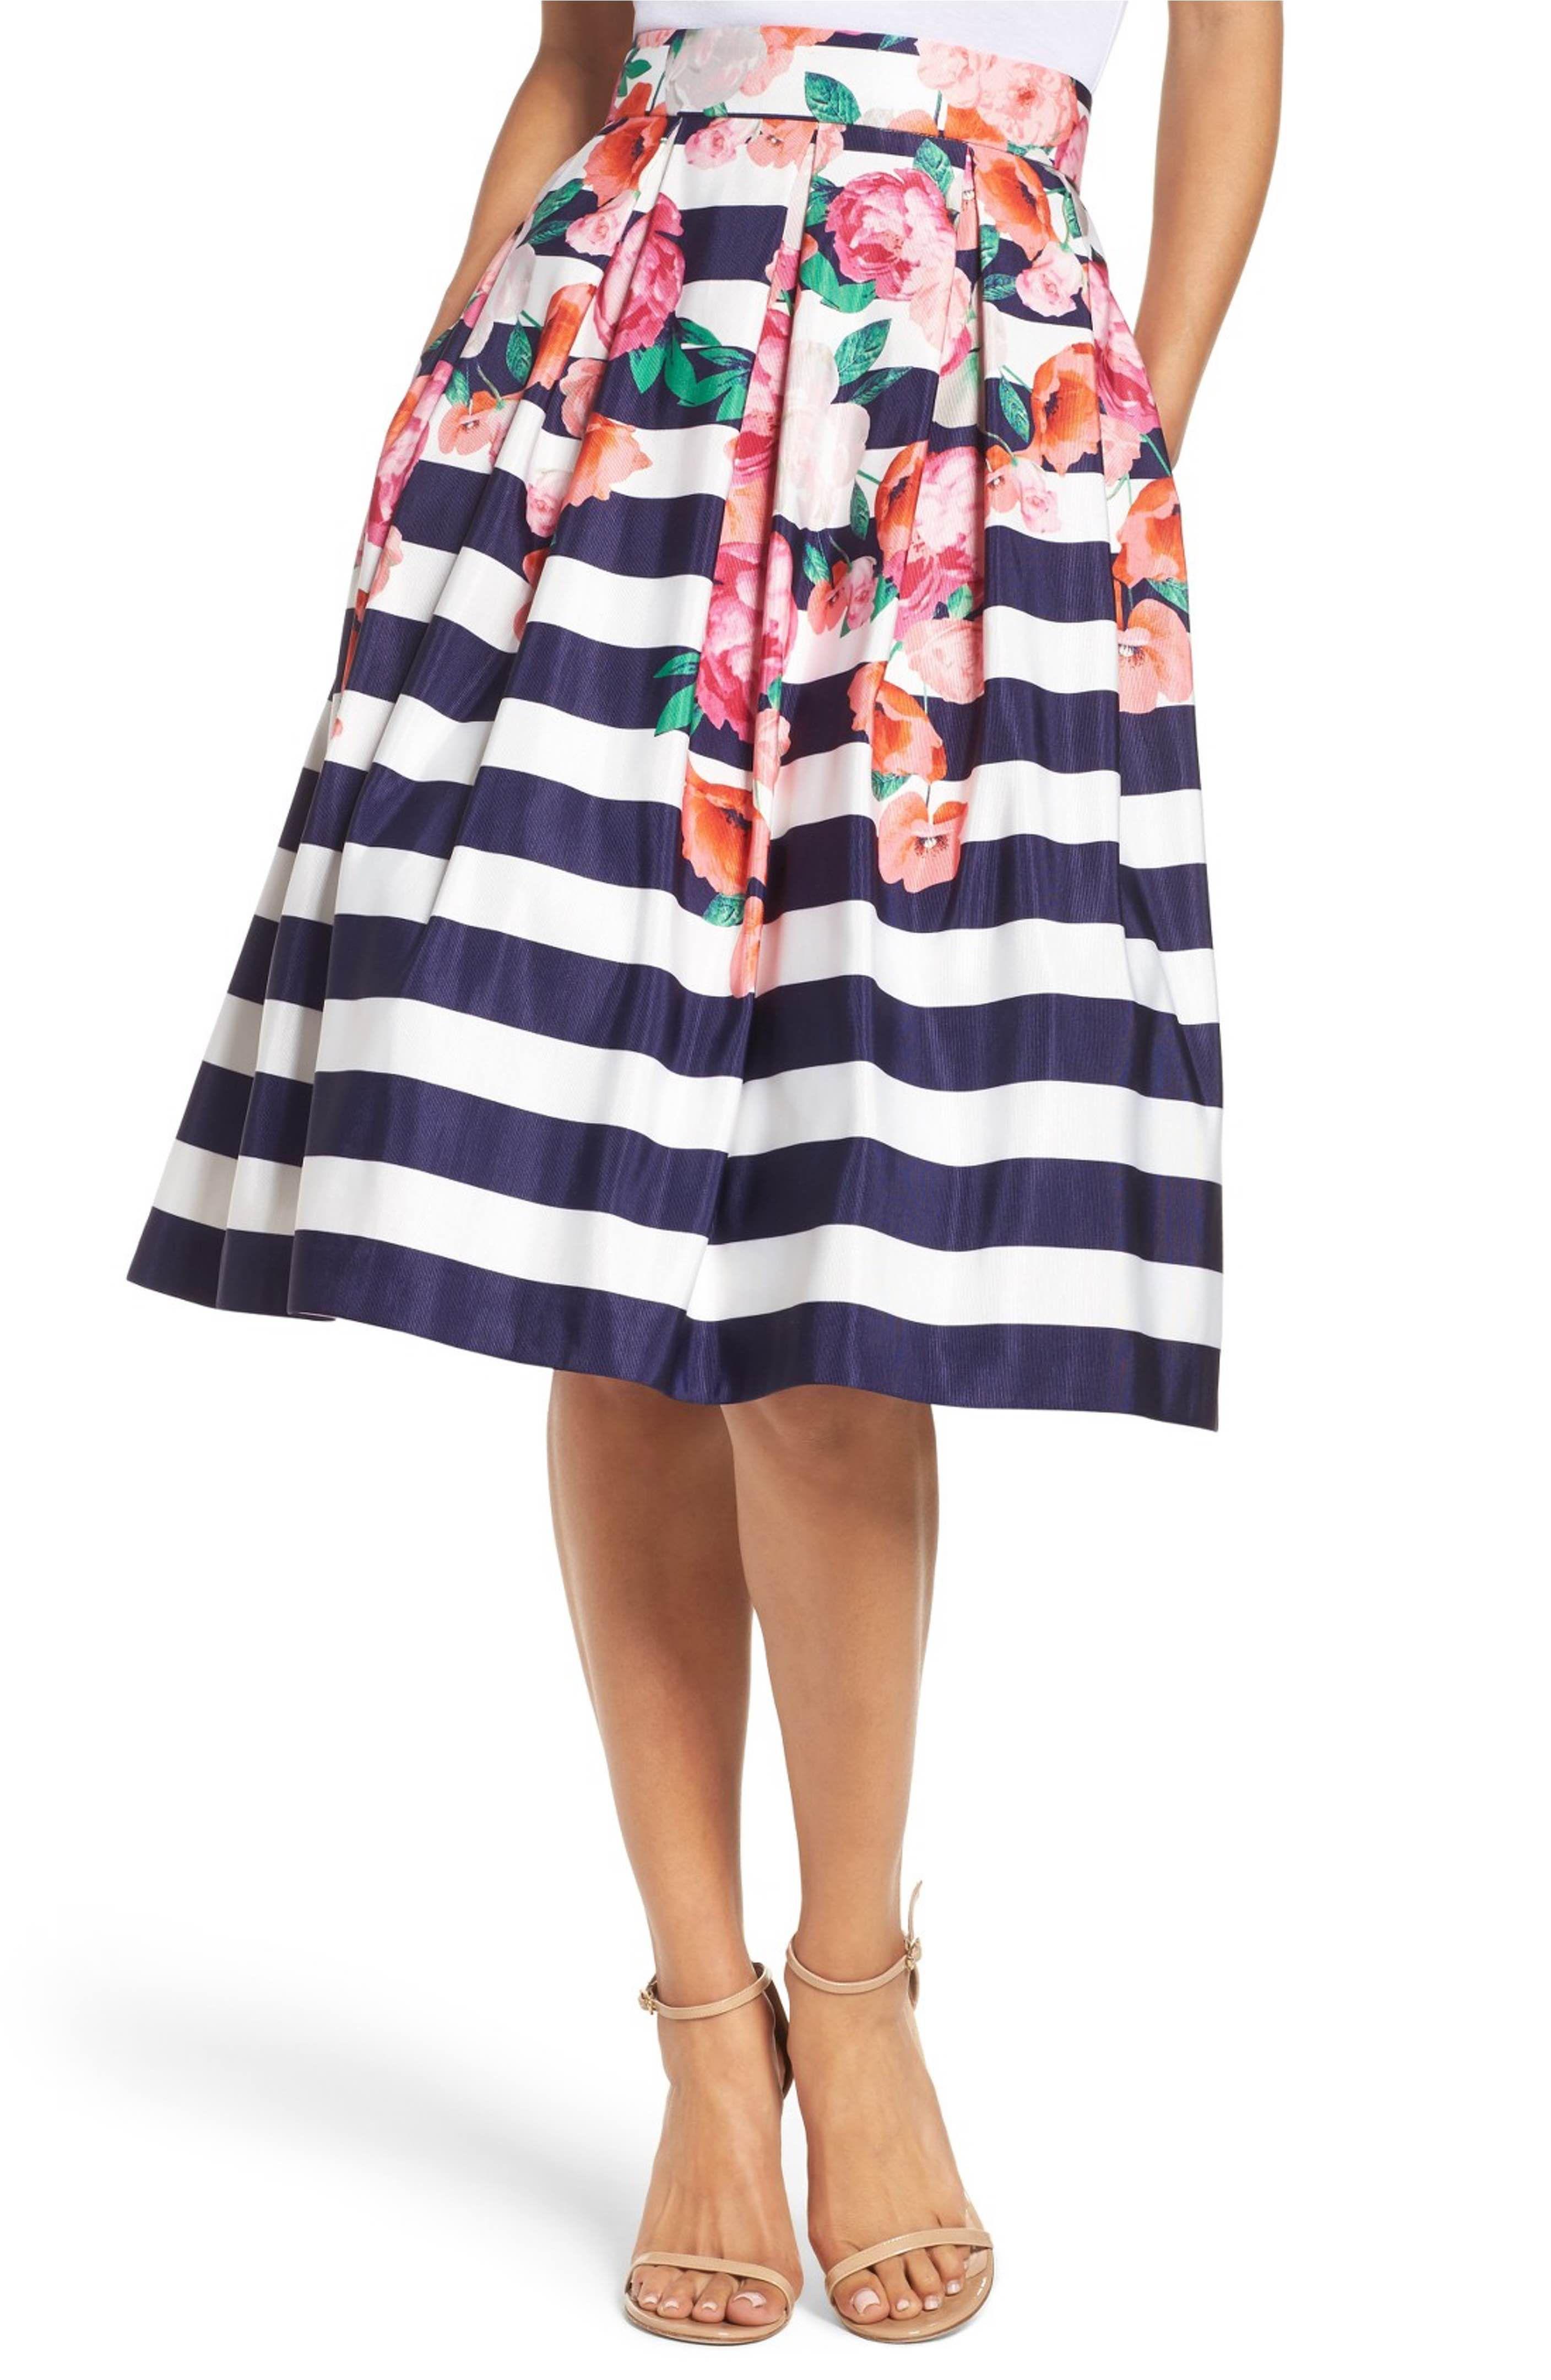 Main image eliza j floral stripe midi skirt modcloth